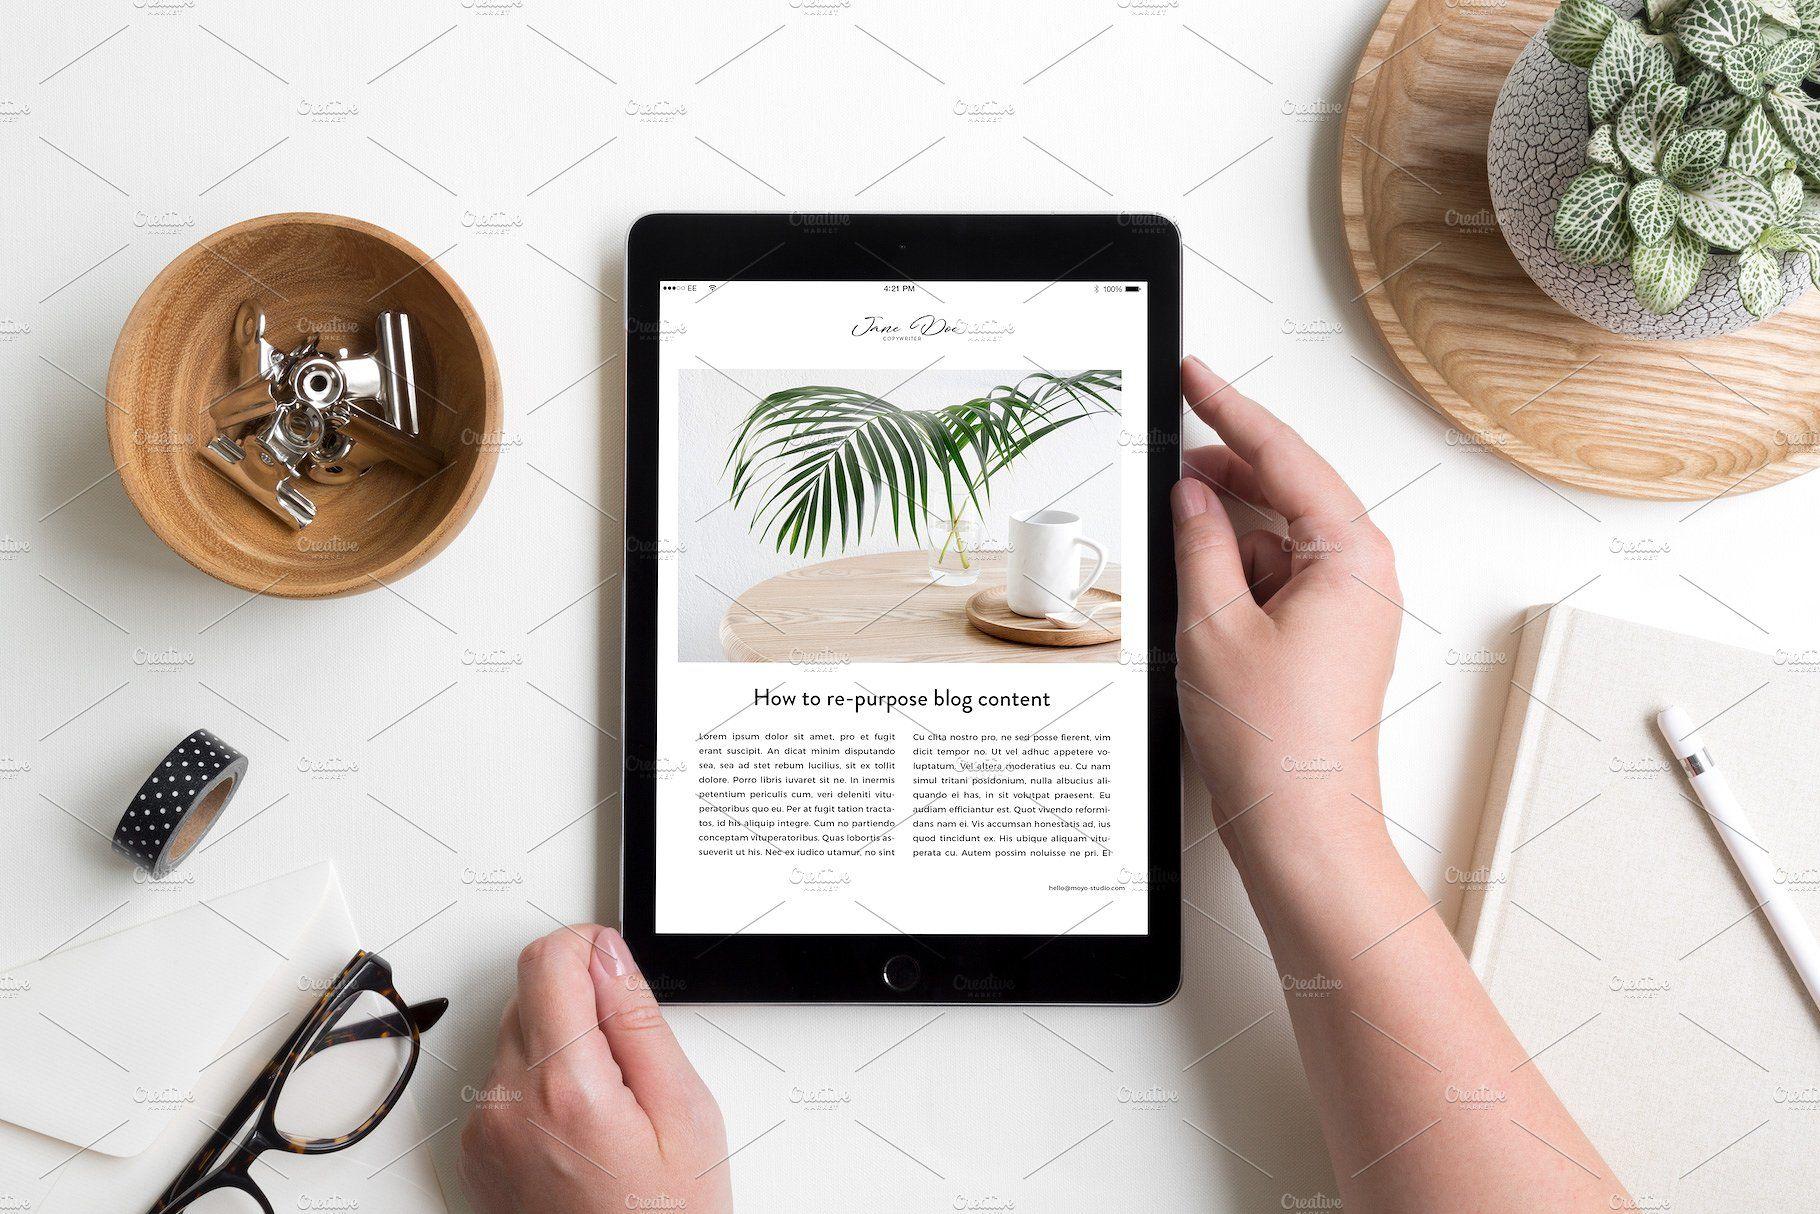 iPad Lifestyle Flat Lay Photo Mockup #save#placeholder#click